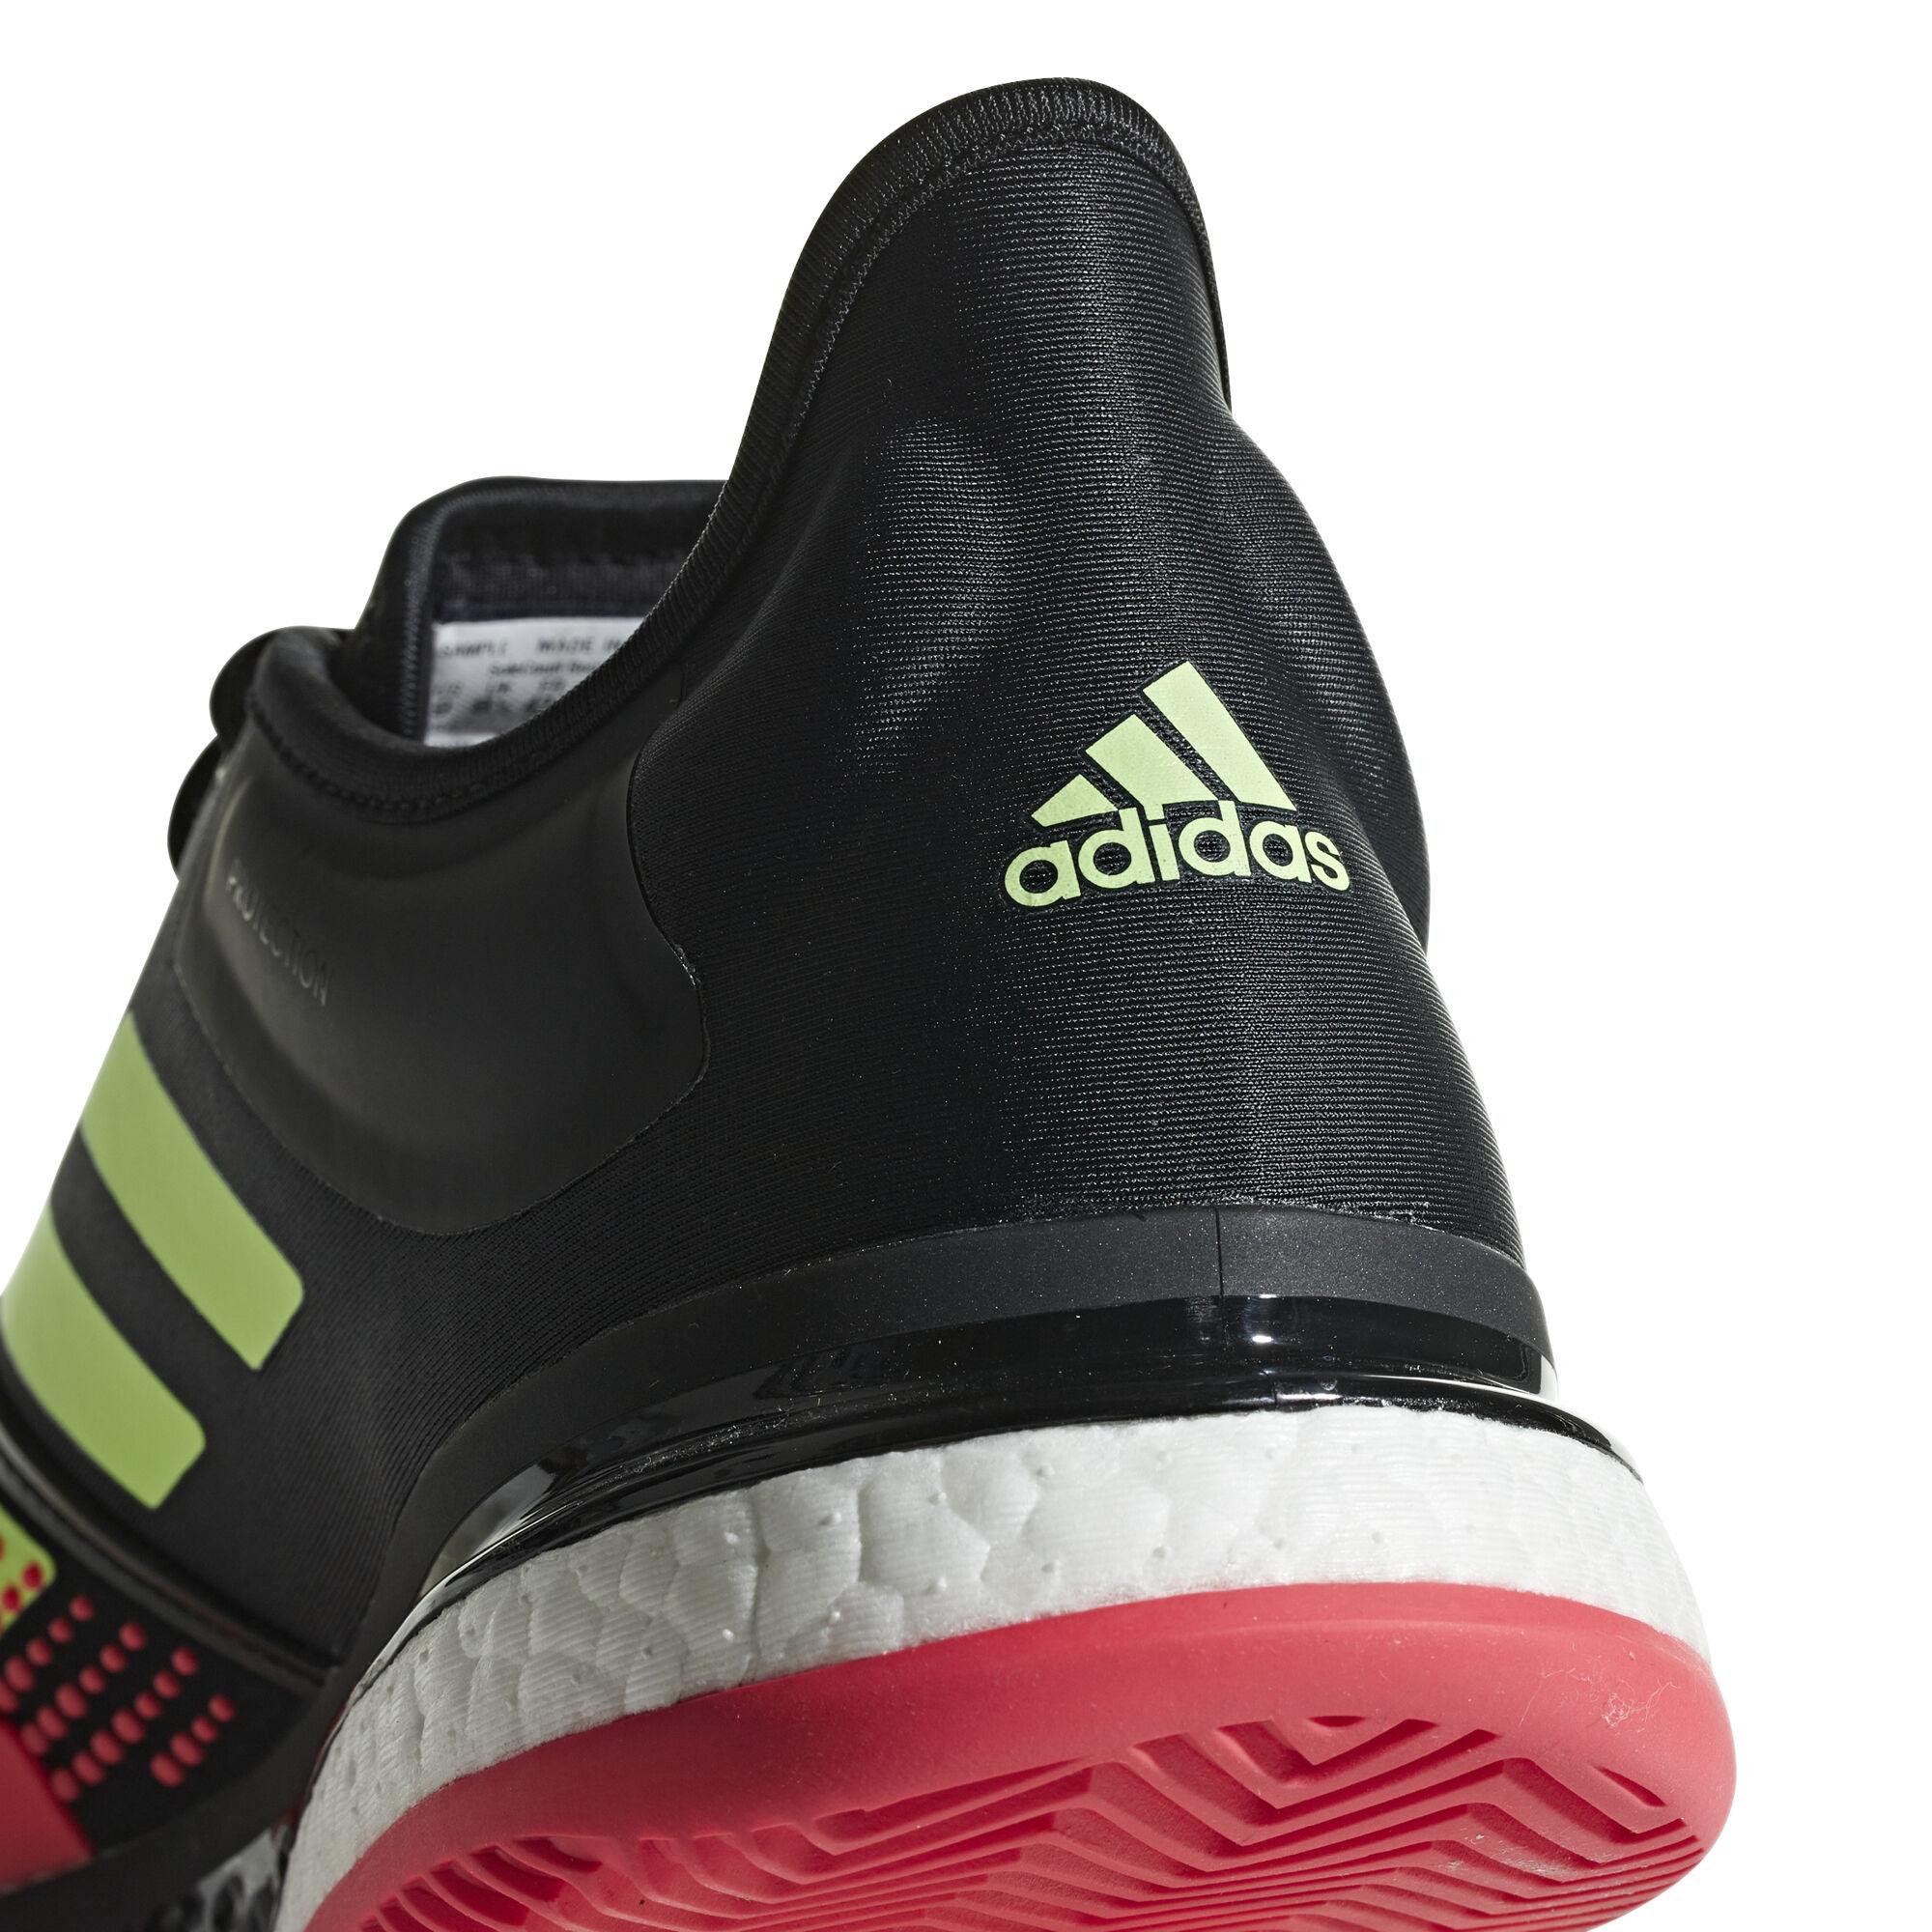 adidas boost uomo sole court